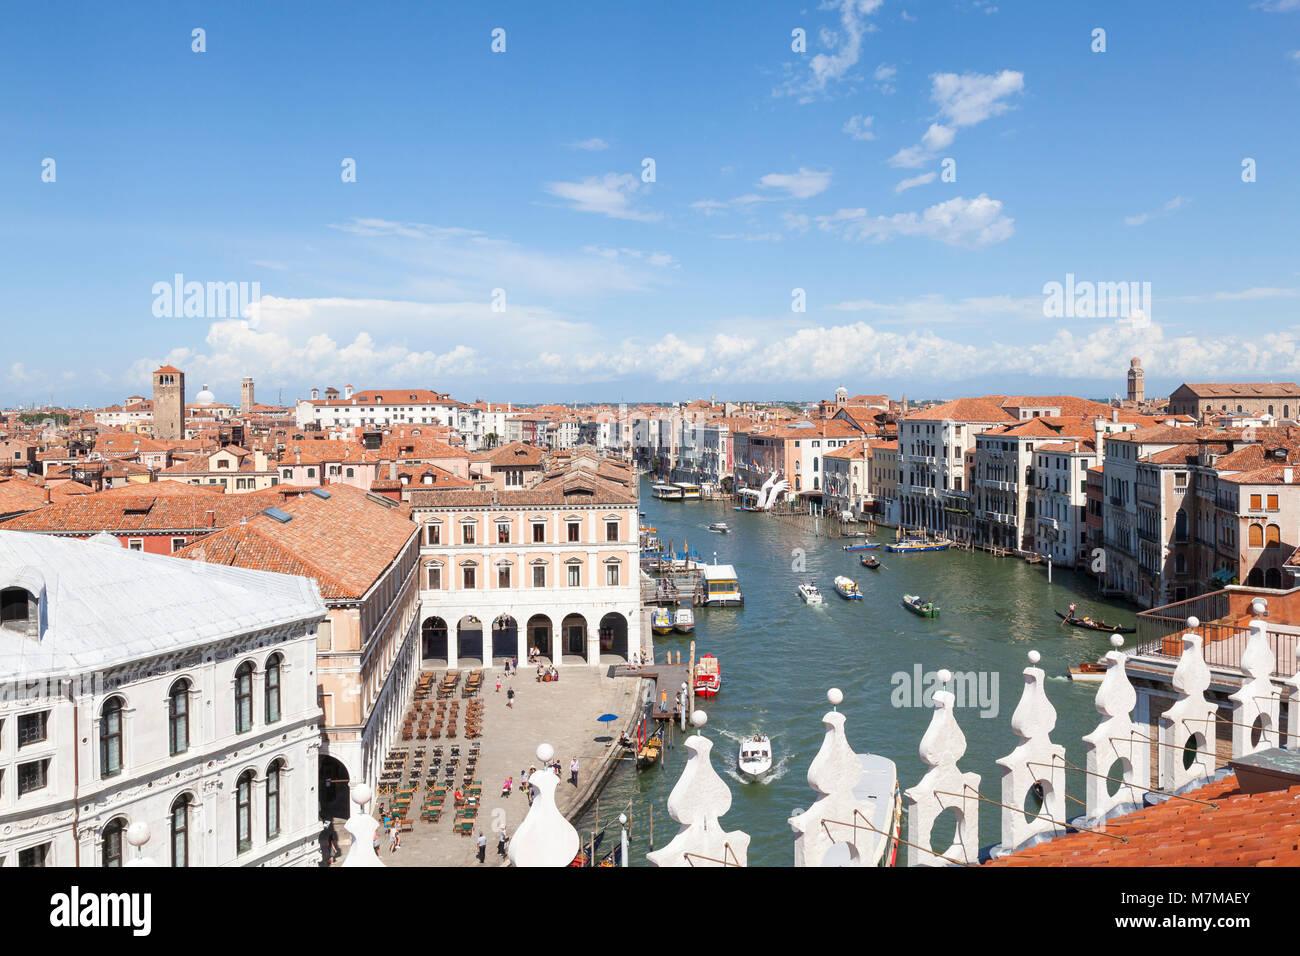 Canal Grande Aerial Immagini Canal Grande Aerial Fotos